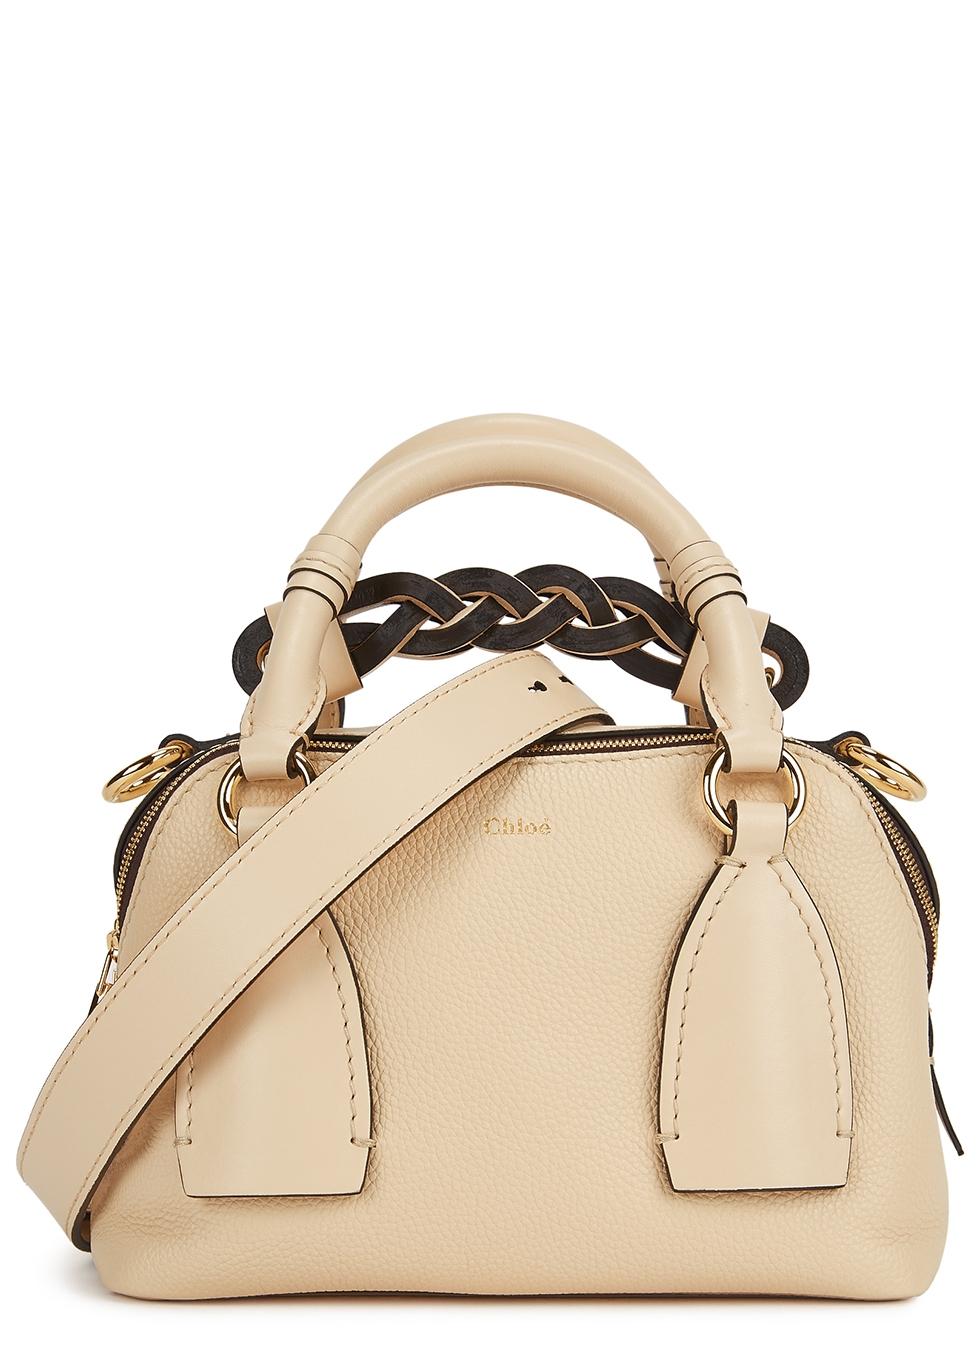 Daria small cream leather shoulder bag